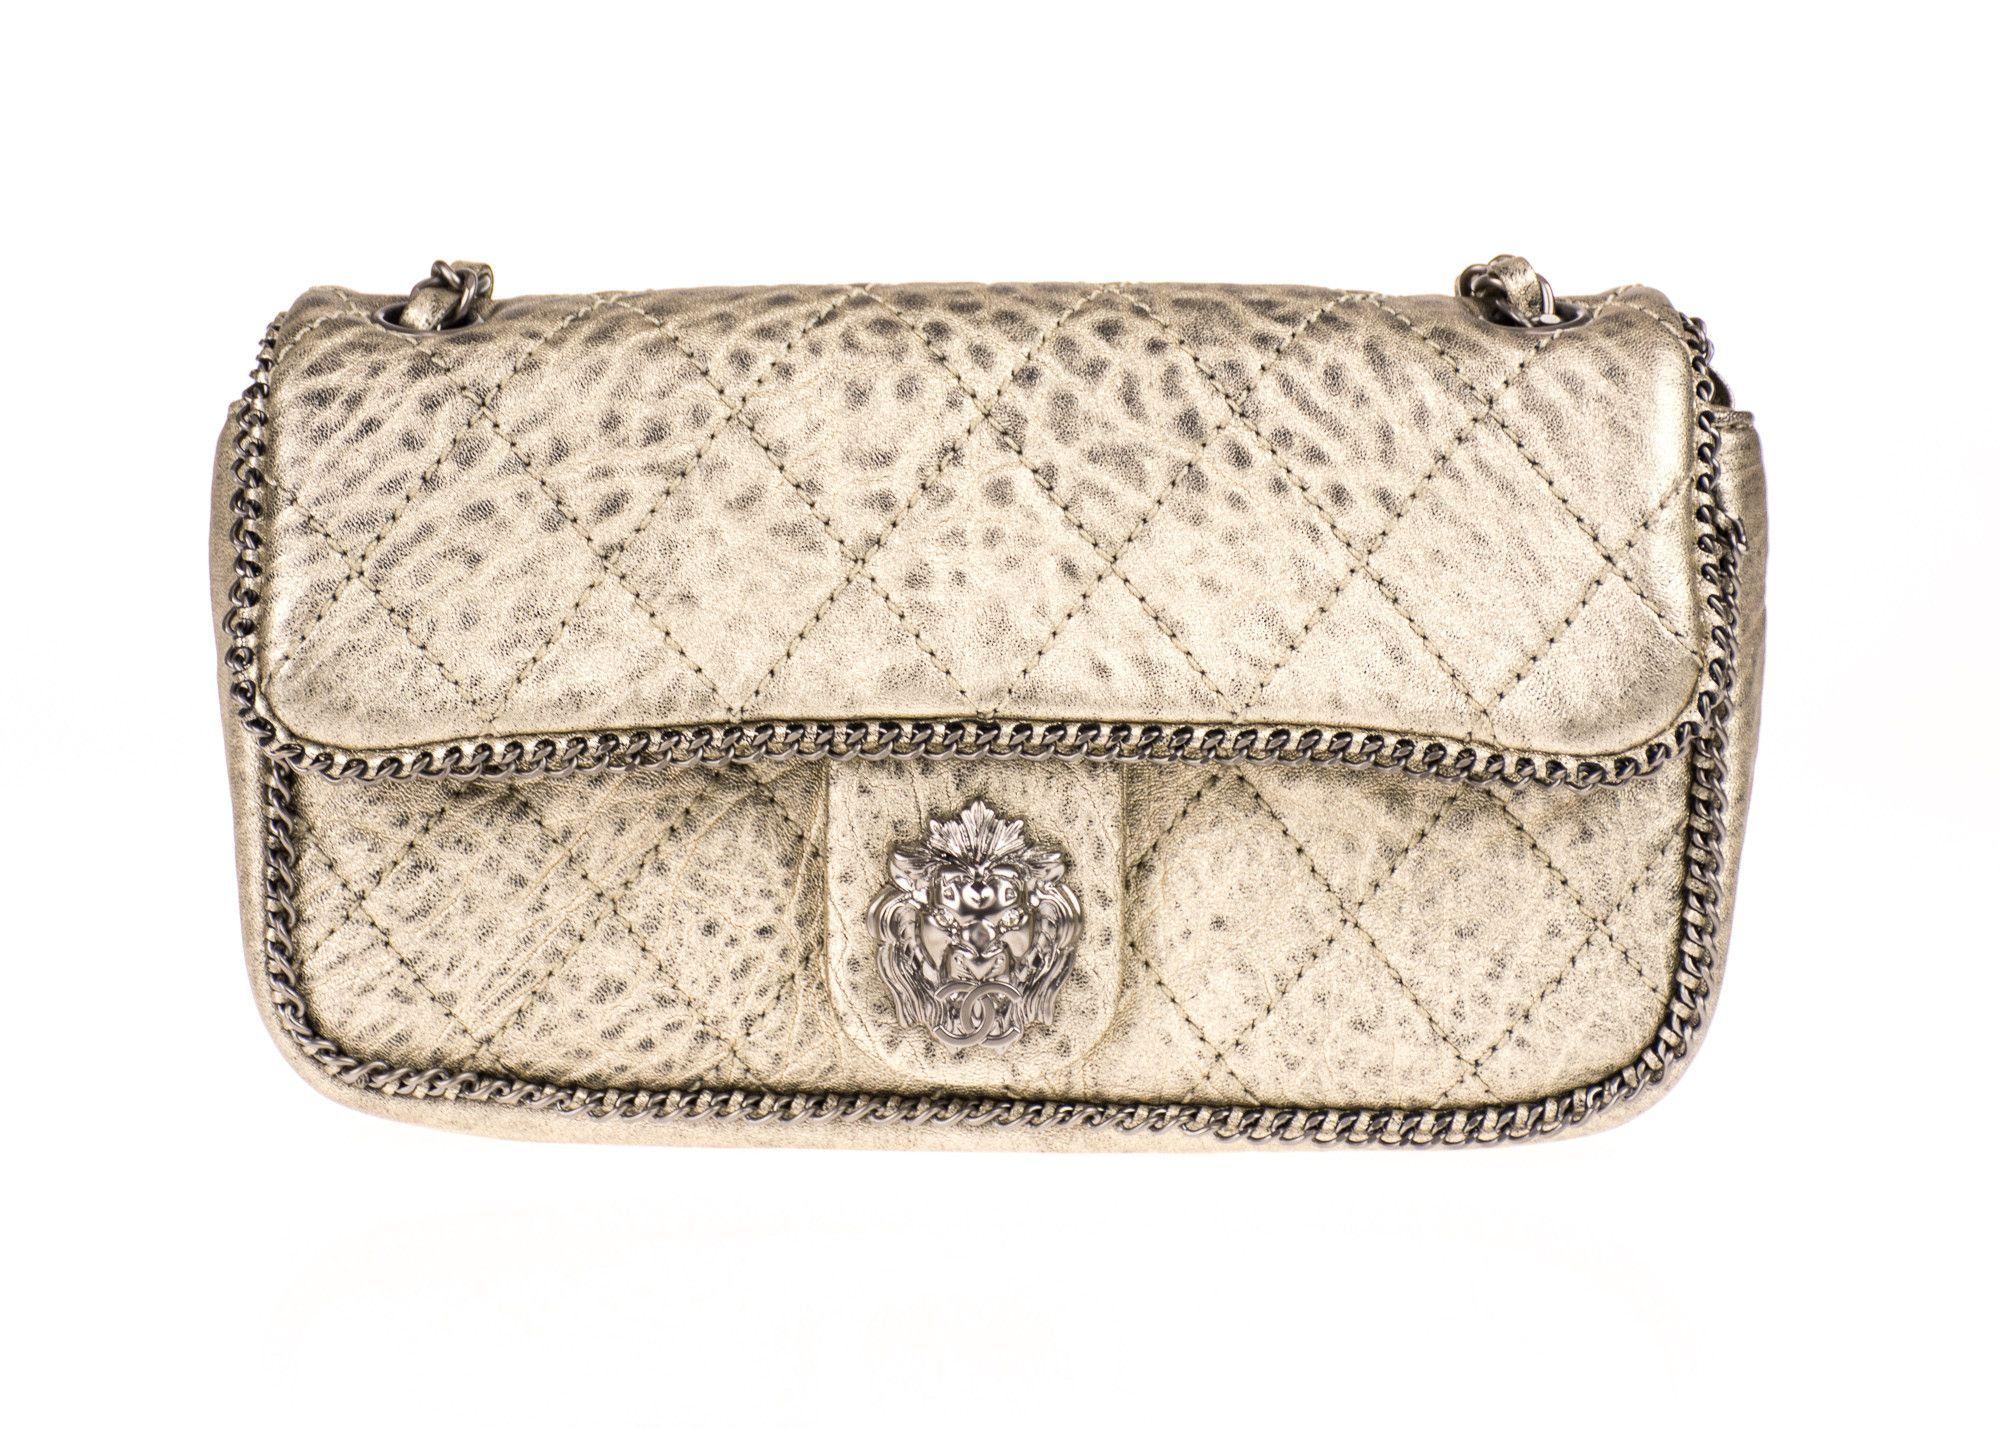 e8cb2c76984a Chanel Medium Metallic Leo Lion Flap Bag | Products | Pinterest ...